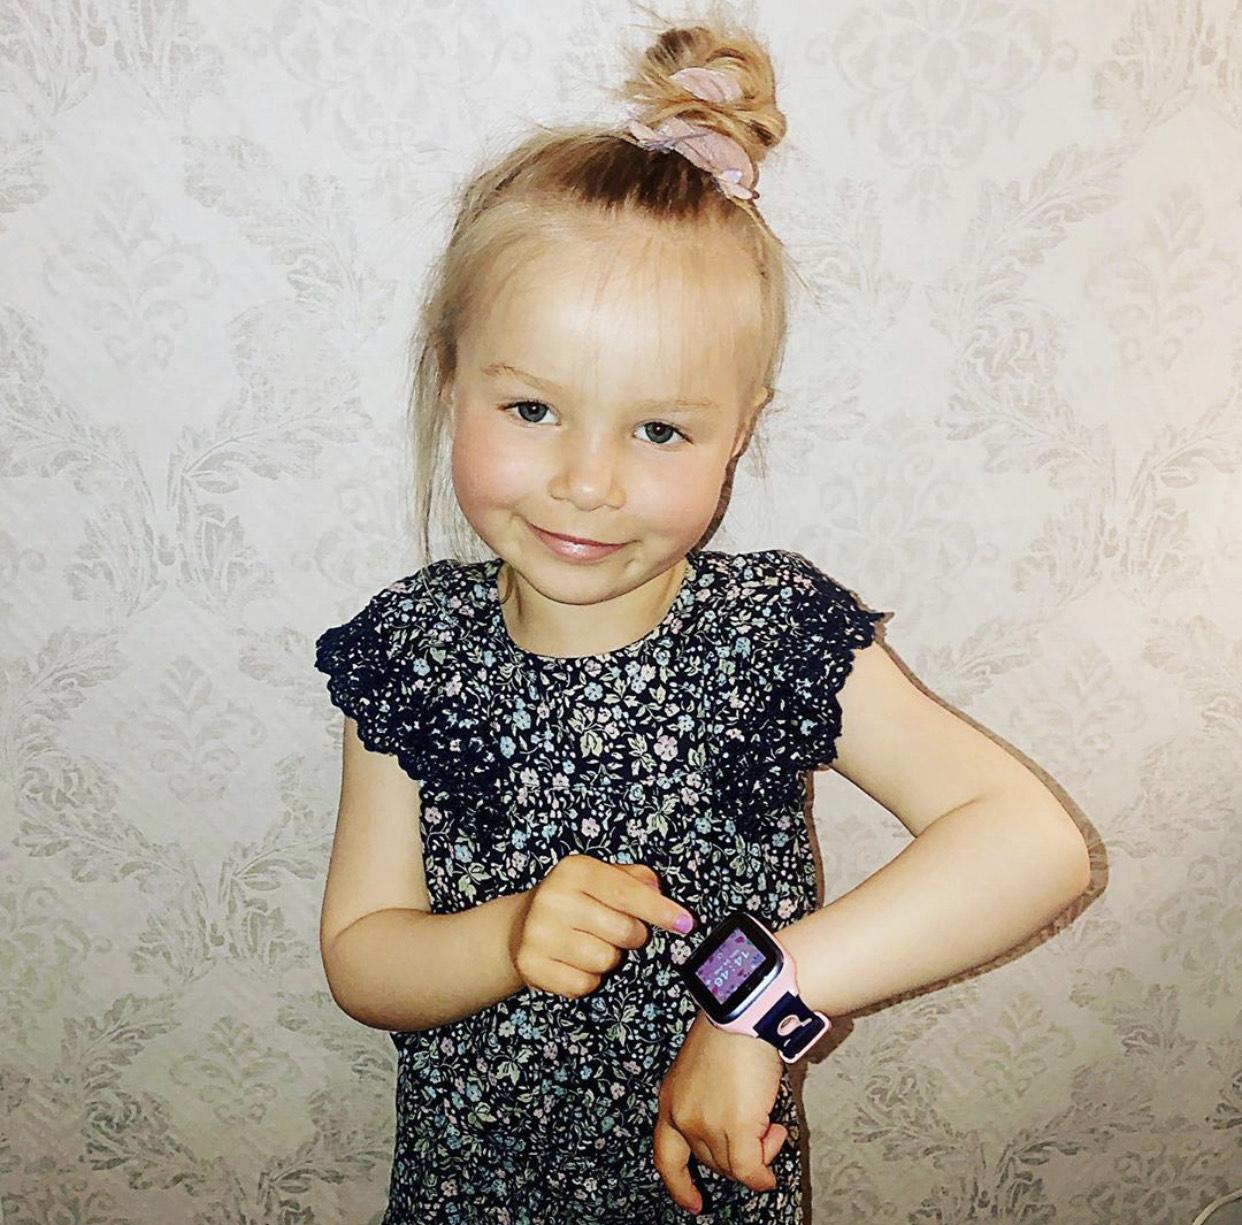 smilende jente som peker på sin rosa xplora klokke.